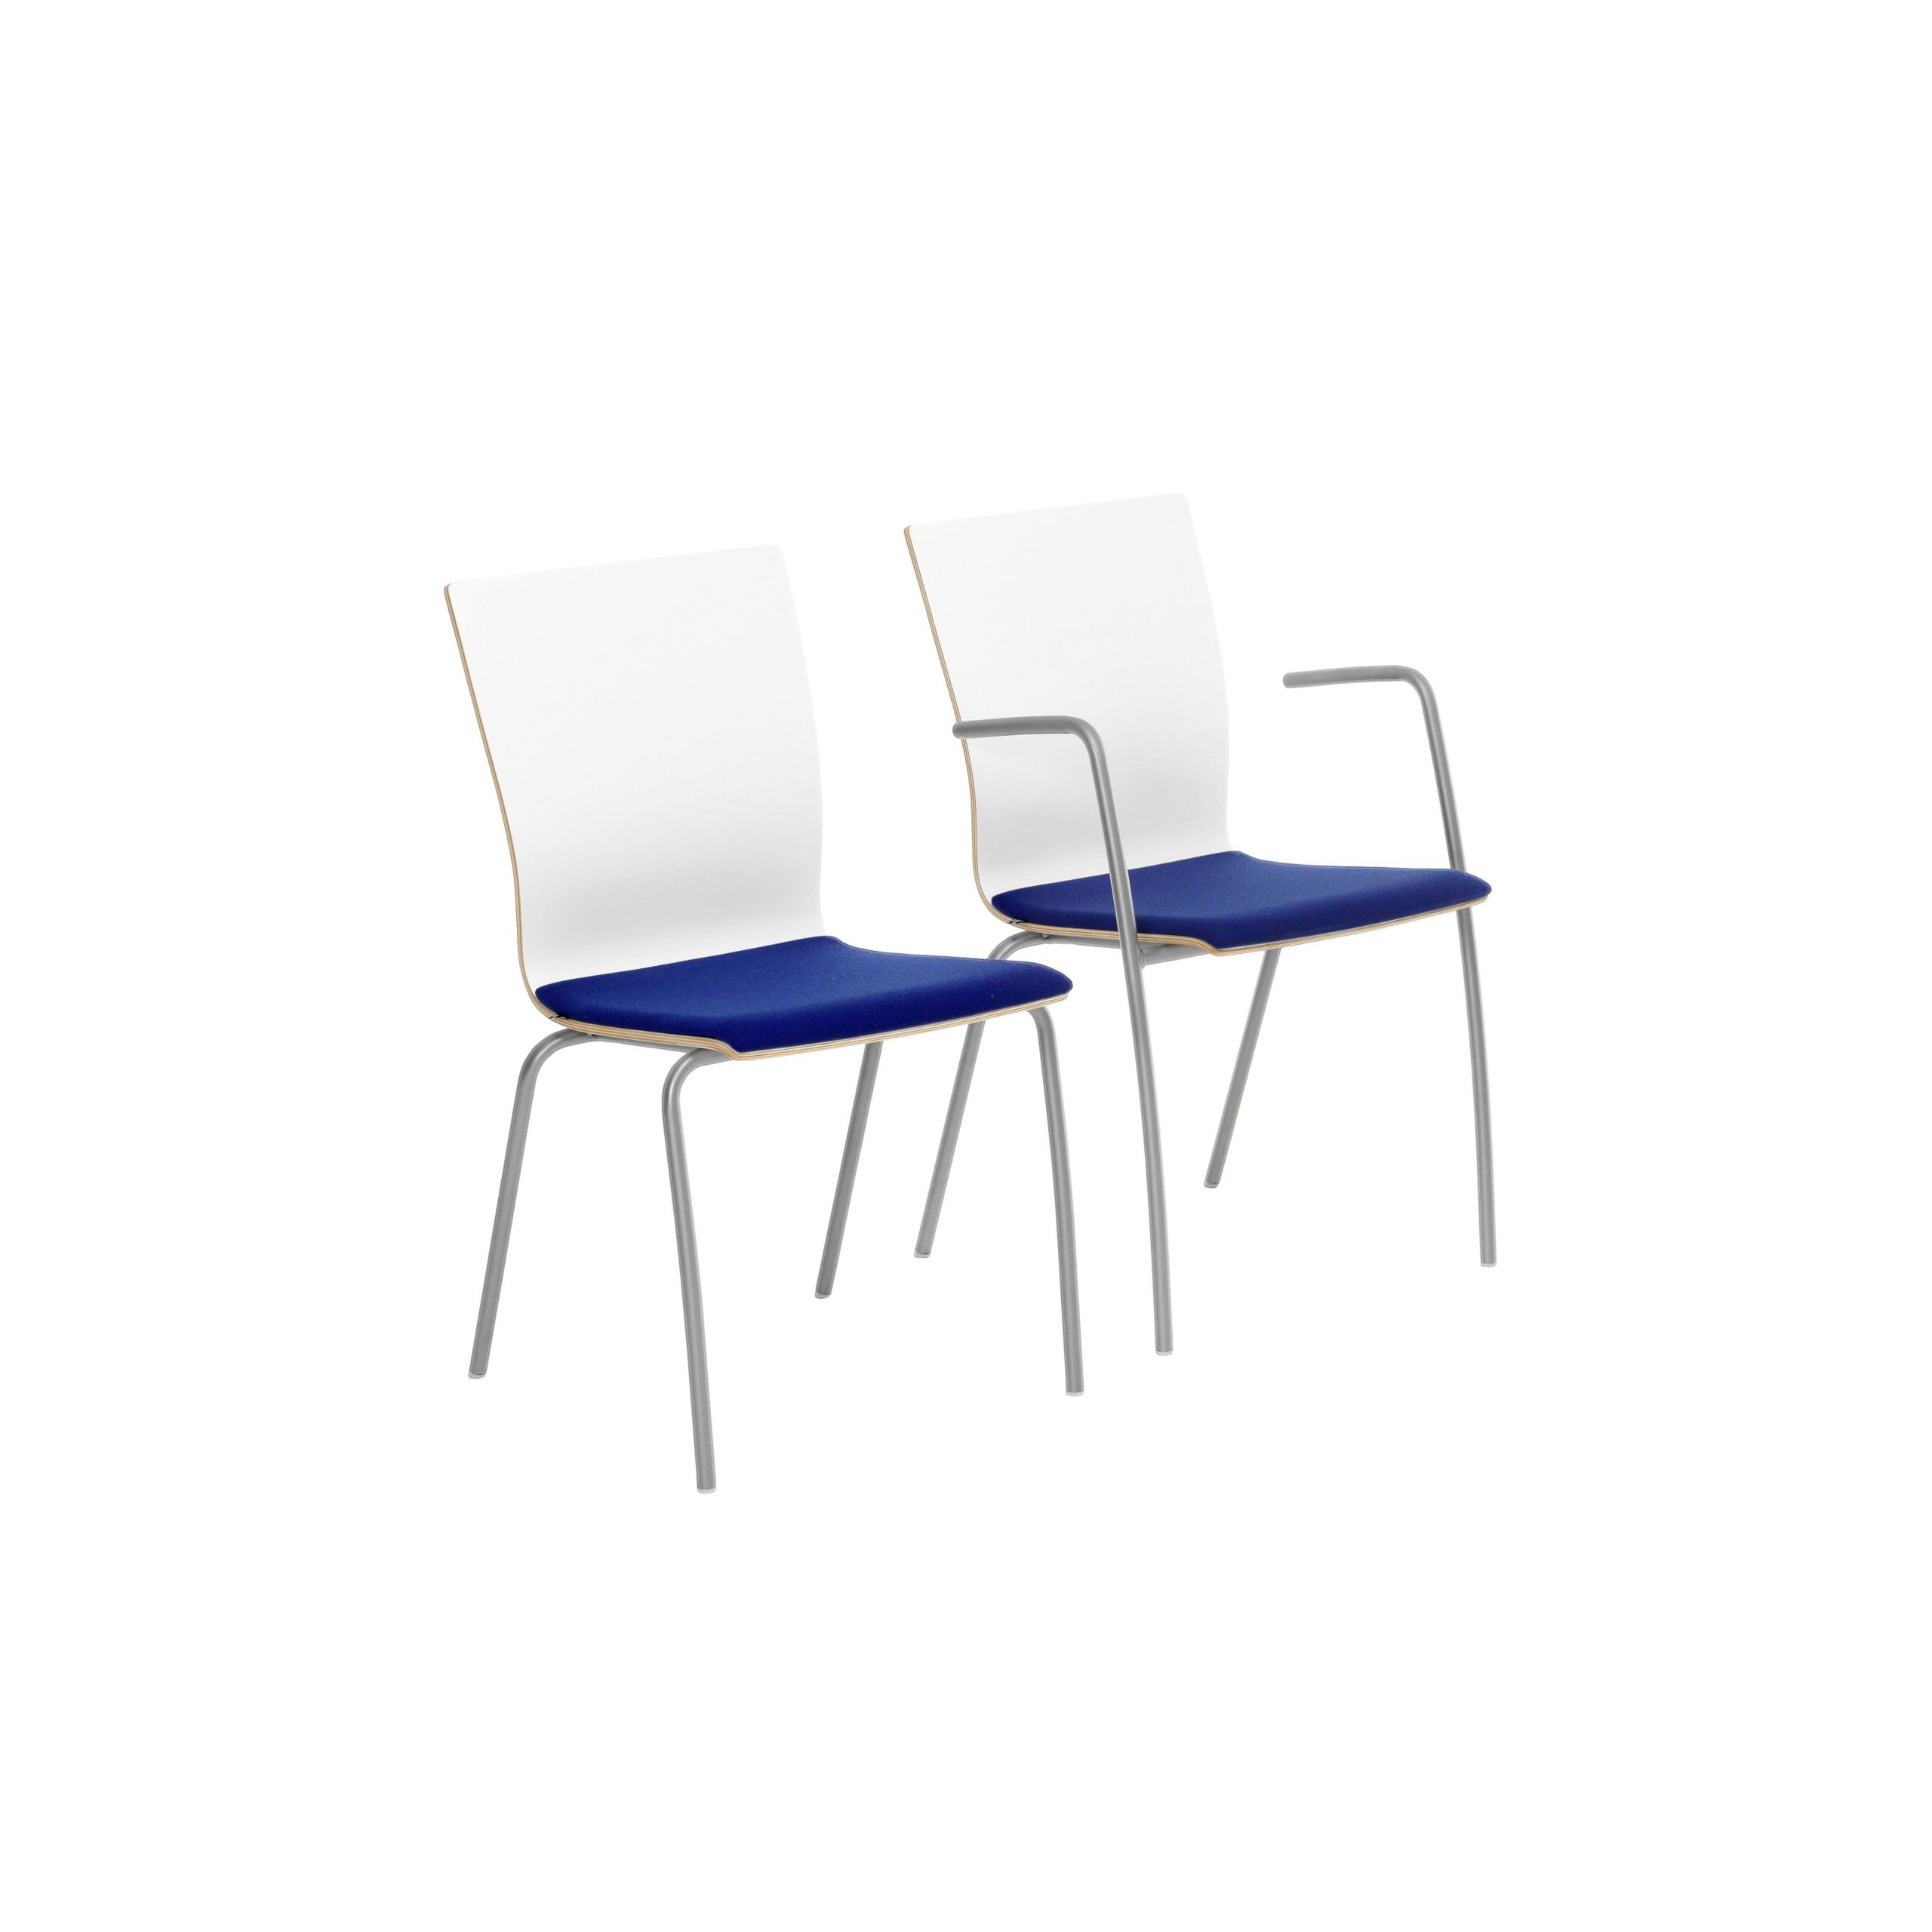 Sit Stol med metallben produktbild 4